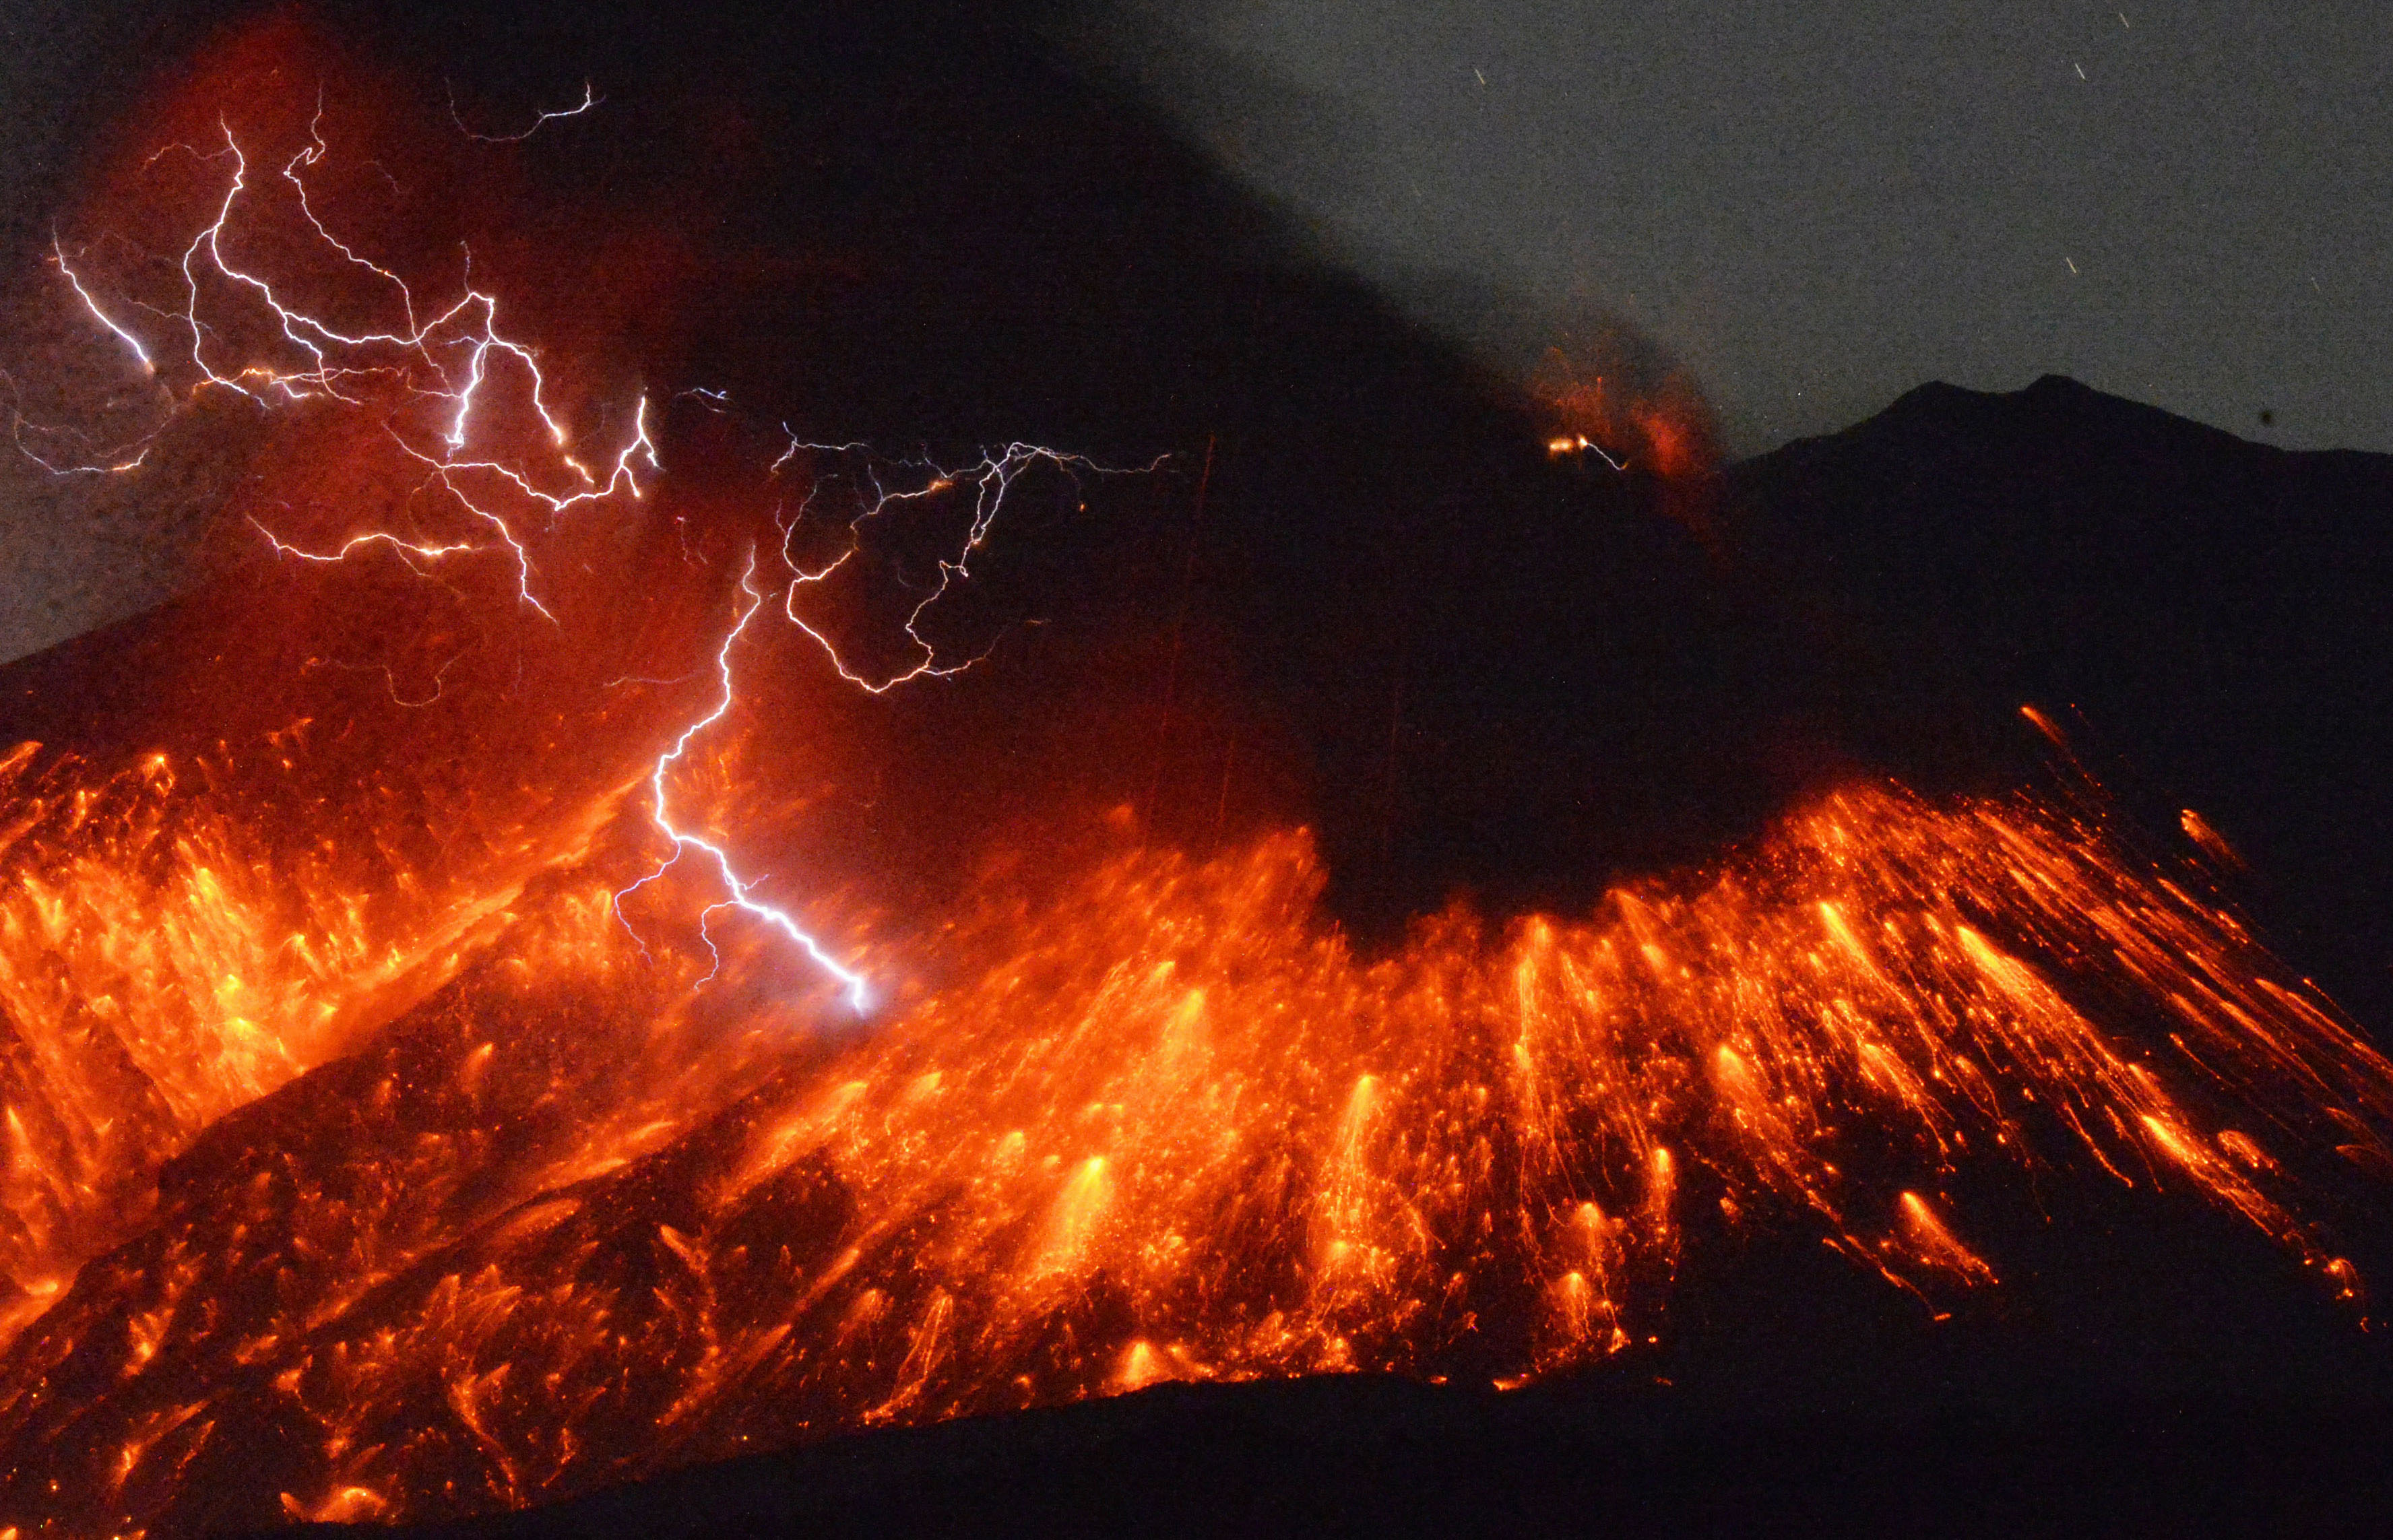 Momentul spectaculos in care vulcanul Sakurajima a erupt, in apropiere de o centrala nucleara, in Japonia. VIDEO